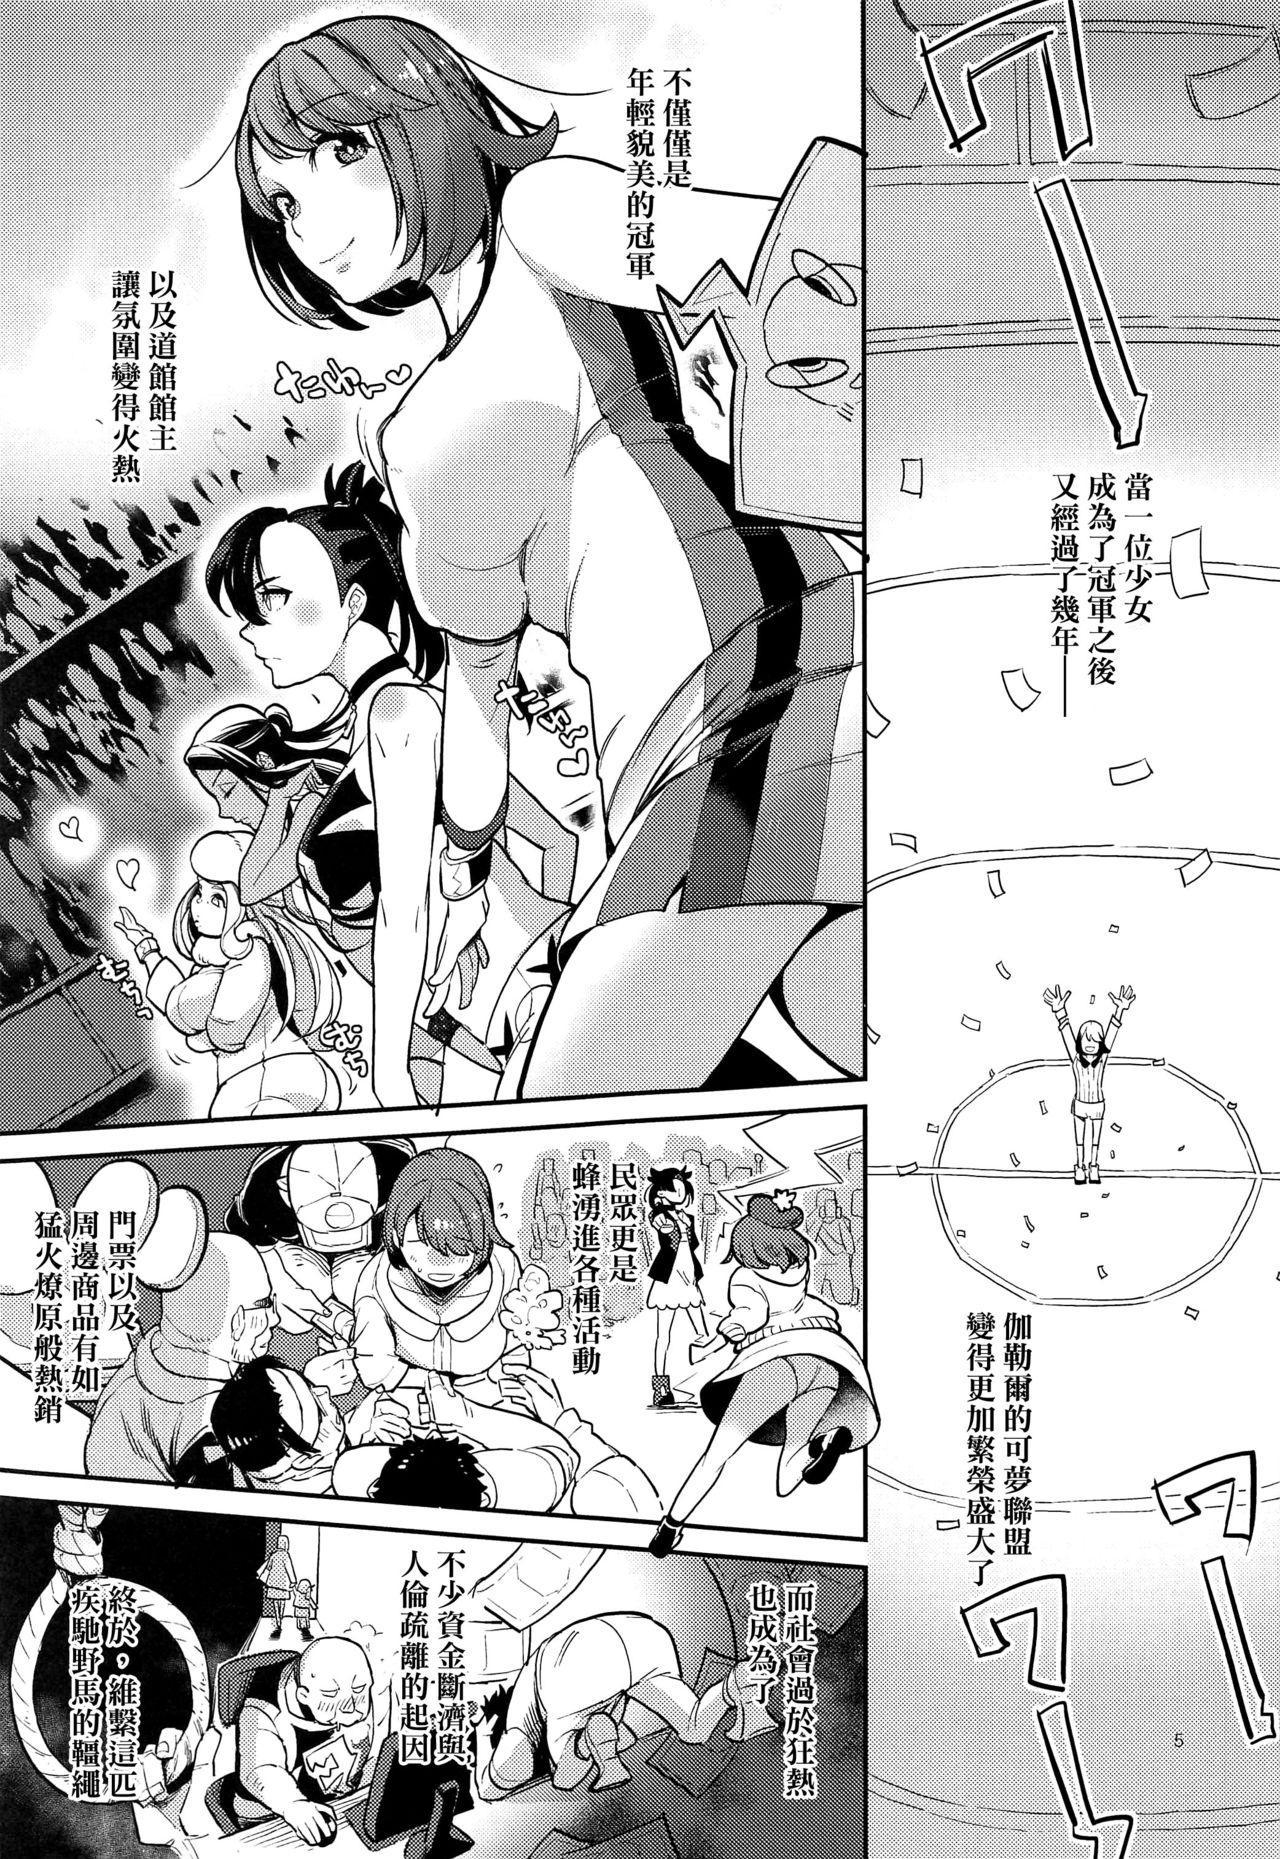 Kibana-san Gomennasai 3